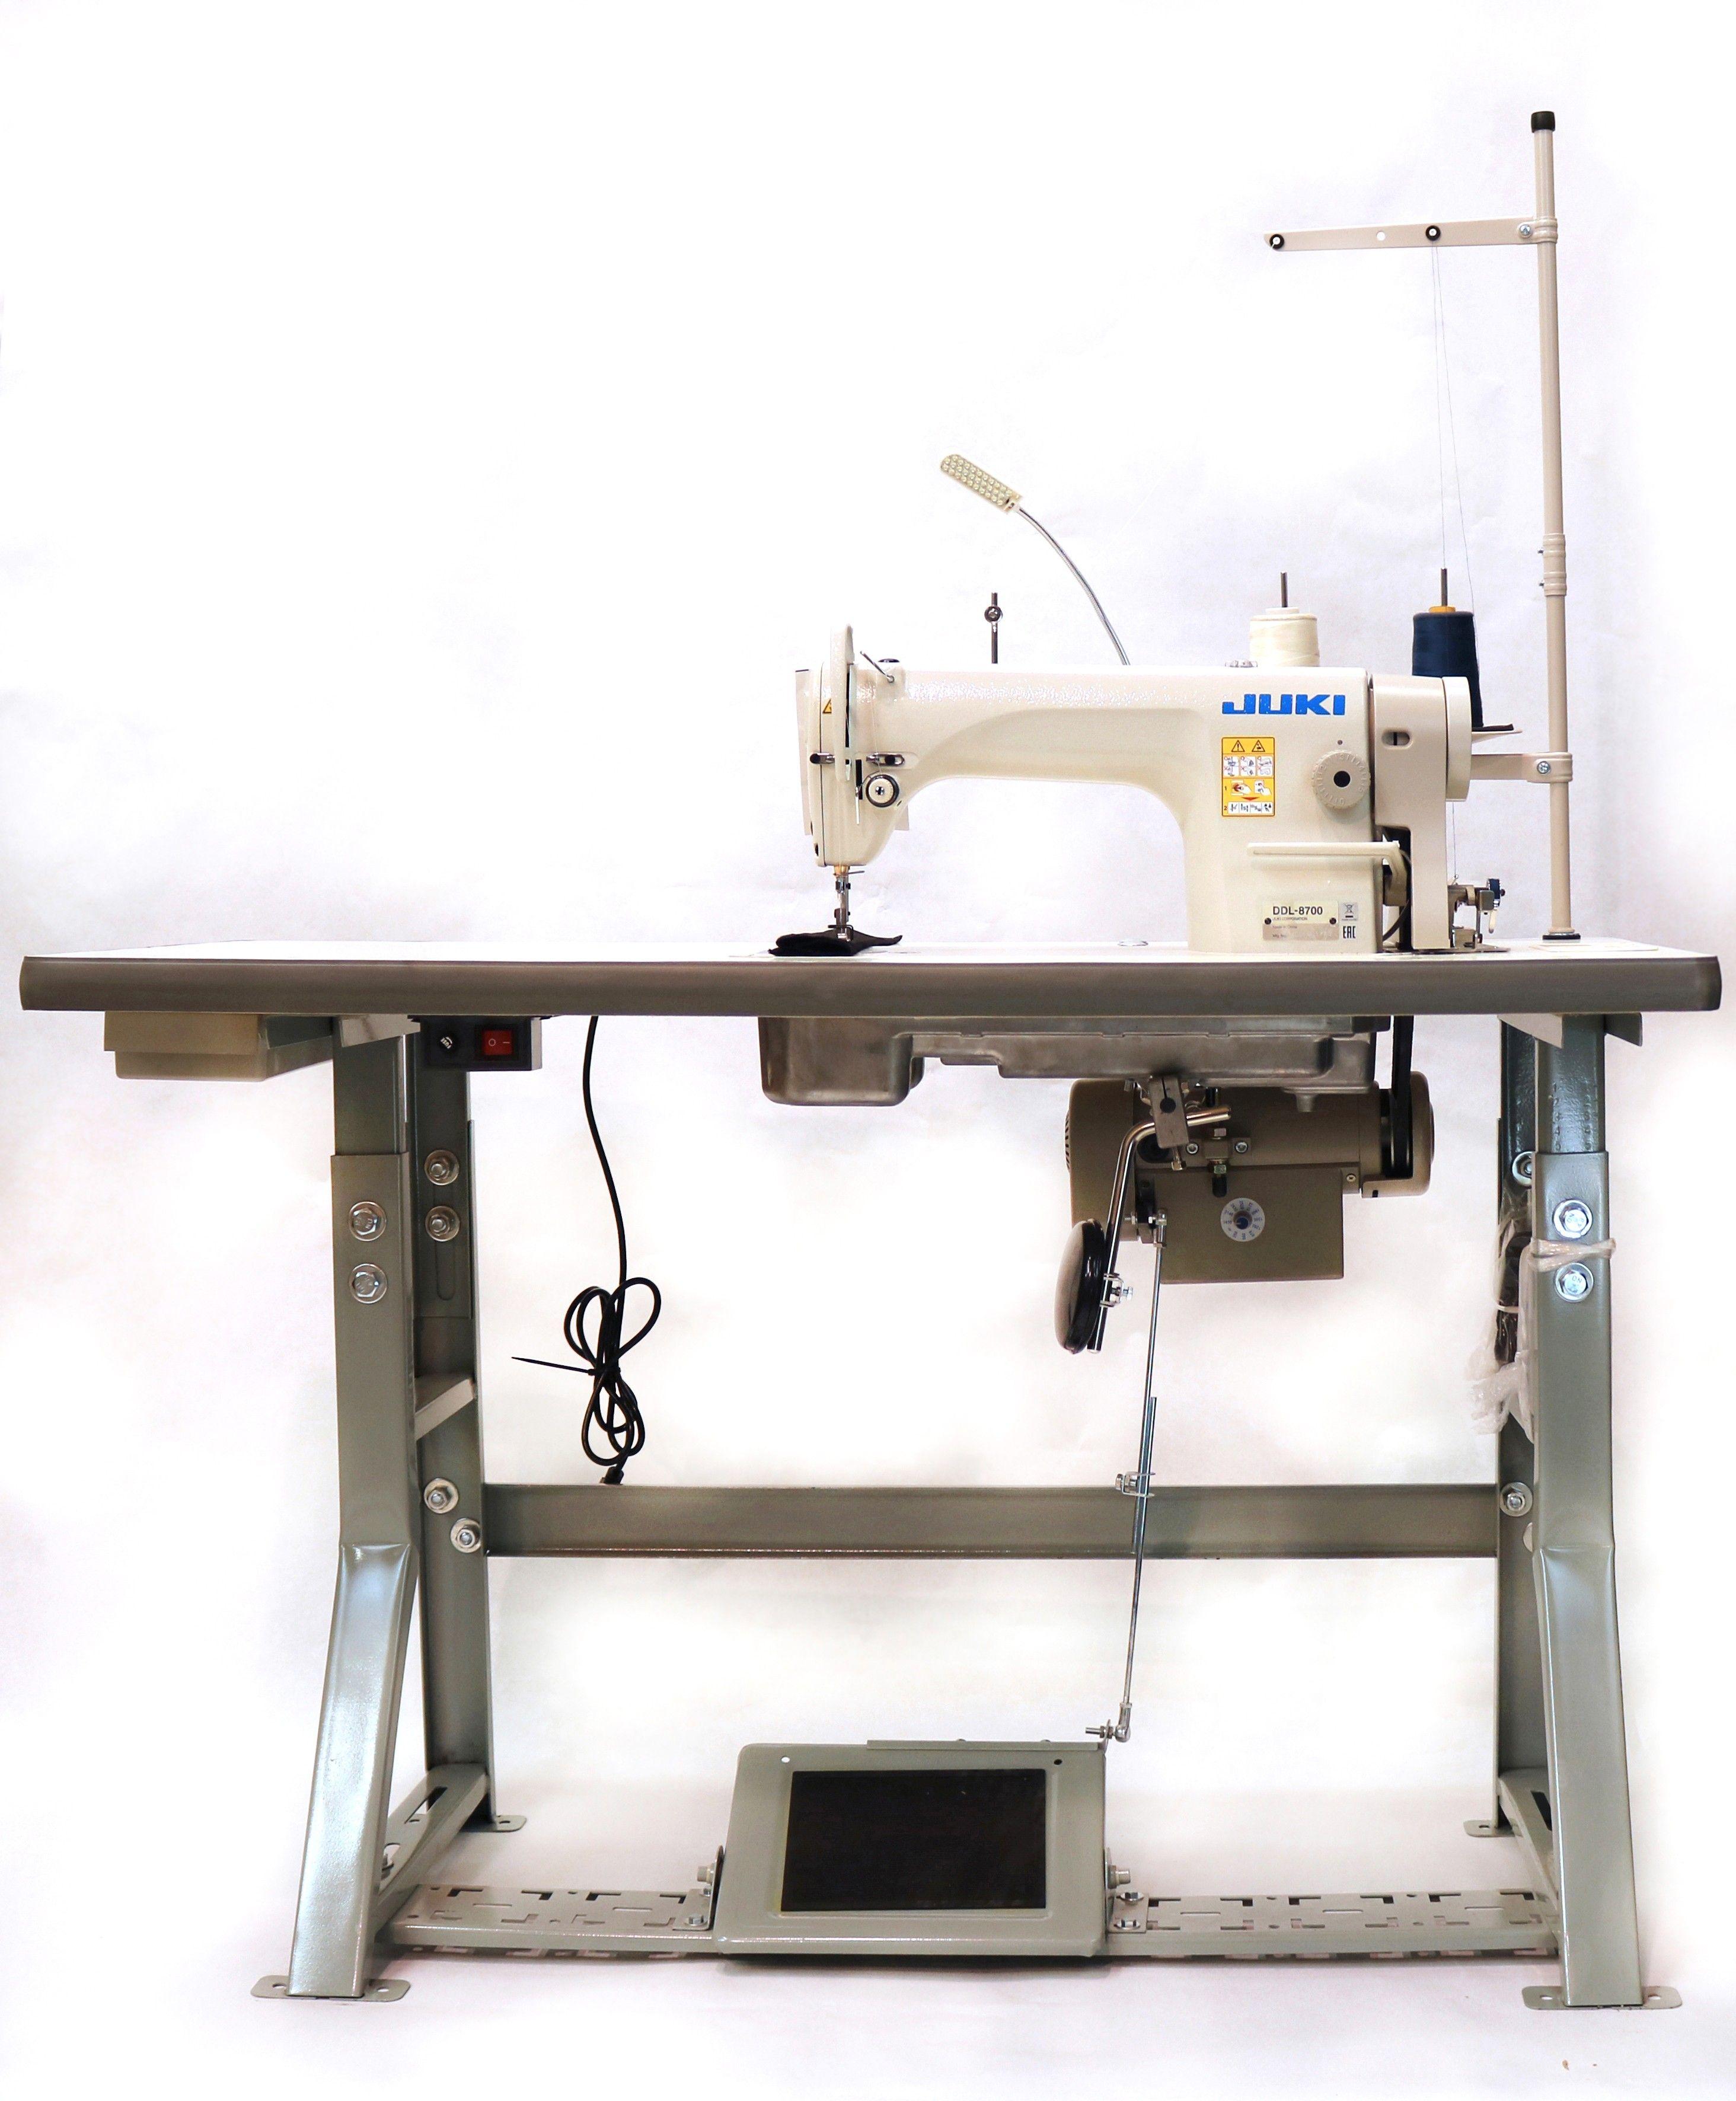 Juki Ddl 8700 High Speed Single Needle Straight Lockstitch